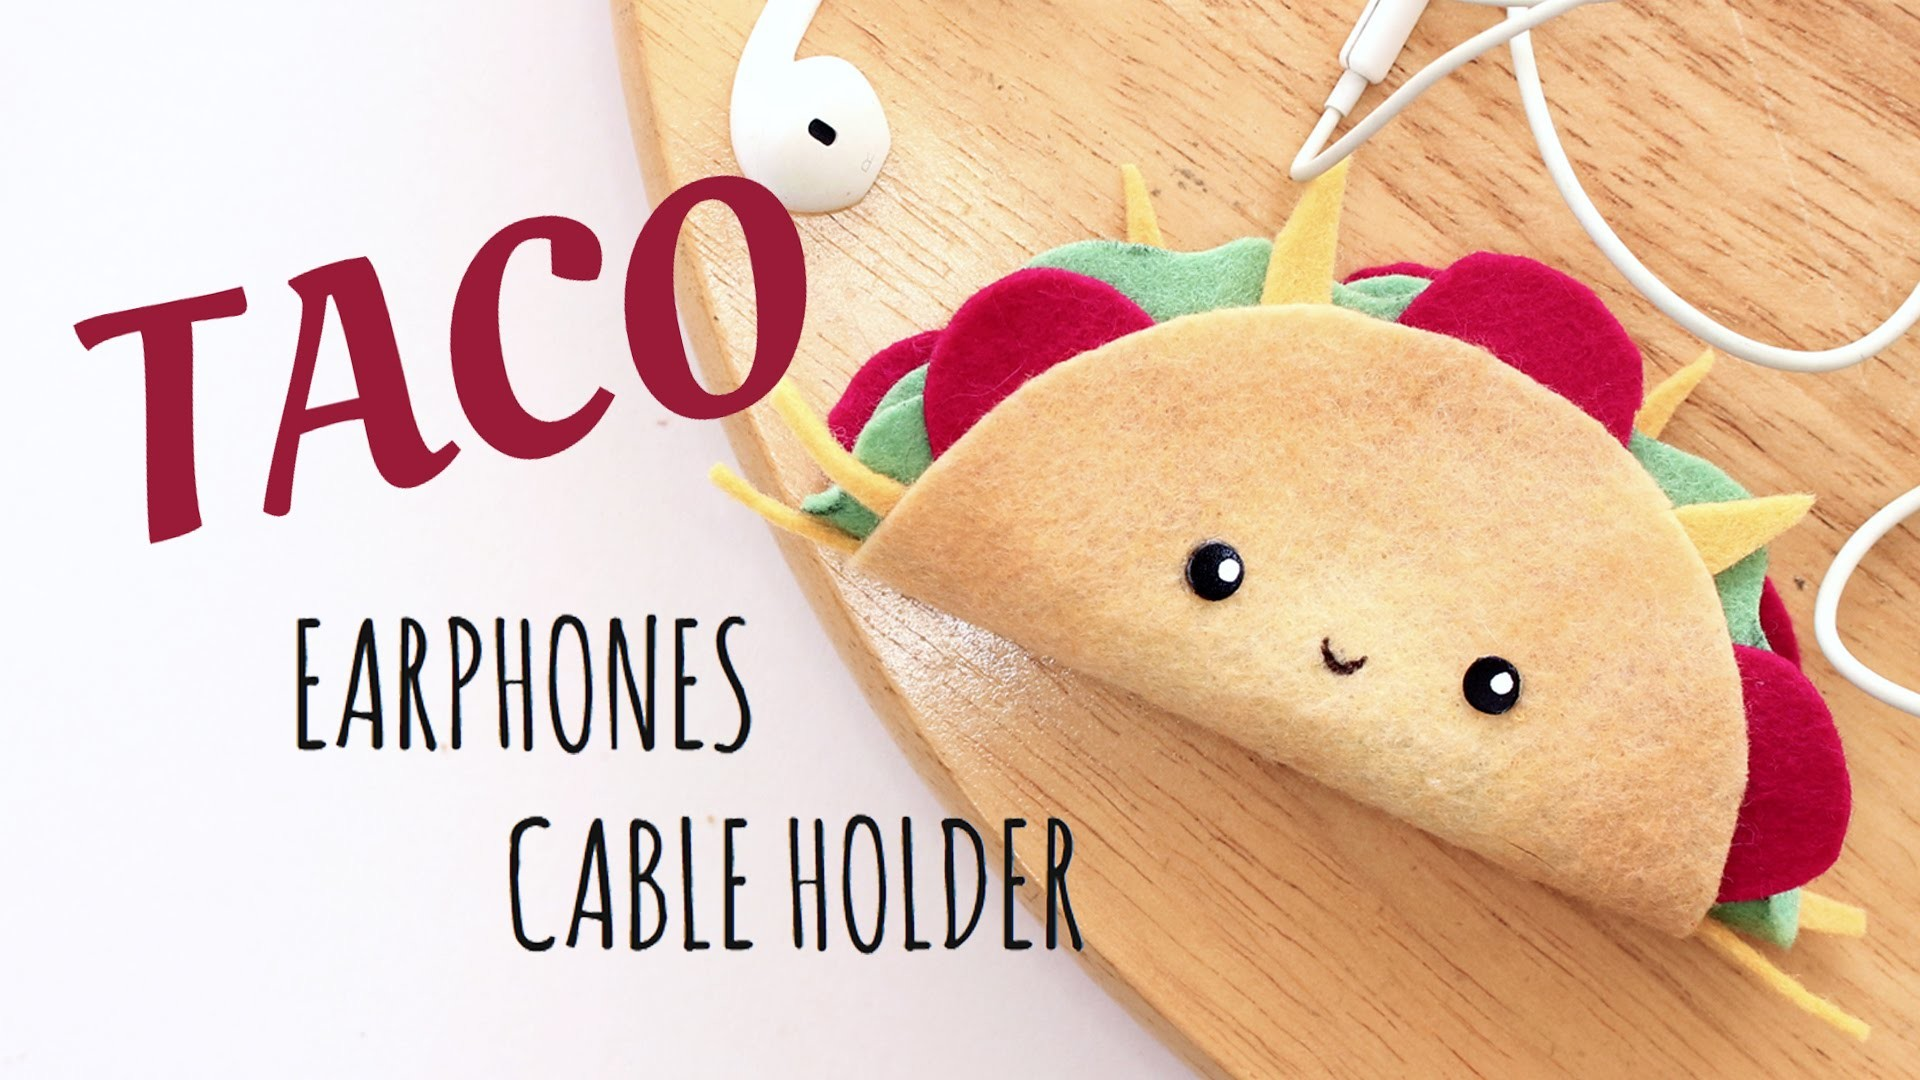 DIY Kawaii Taco - Earphones Cable Holder - No Sewing - 2 Cats & 1 Doll